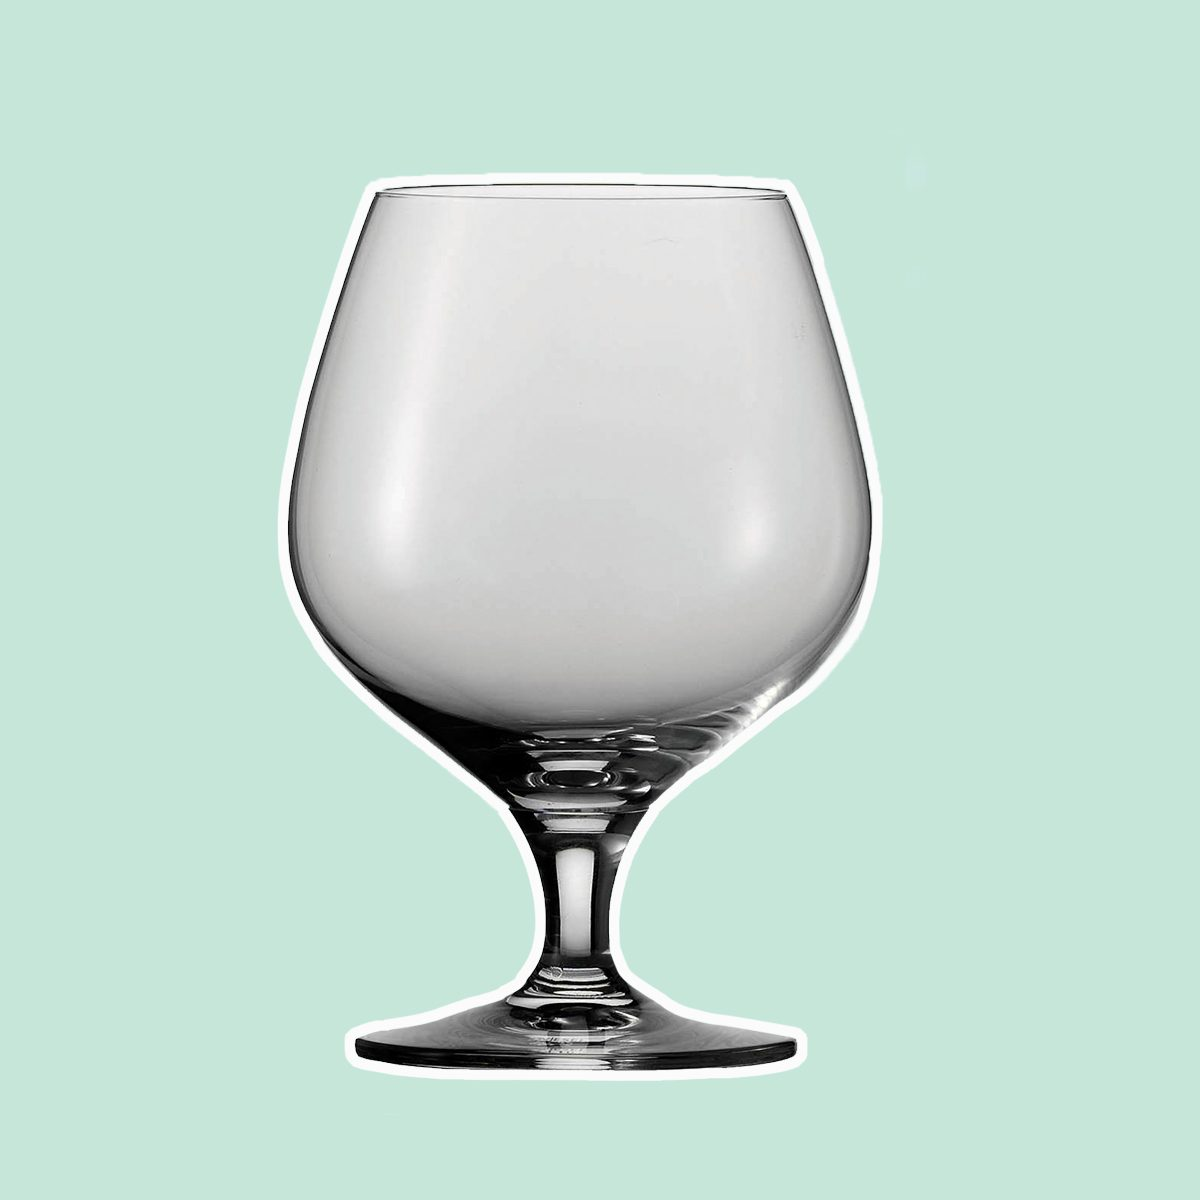 Schott Zwiesel Tritan Crystal Glass Mondial Stemware Collection Brandy Snifter Cocktail Glass, 17.3-Ounce, Set of 6